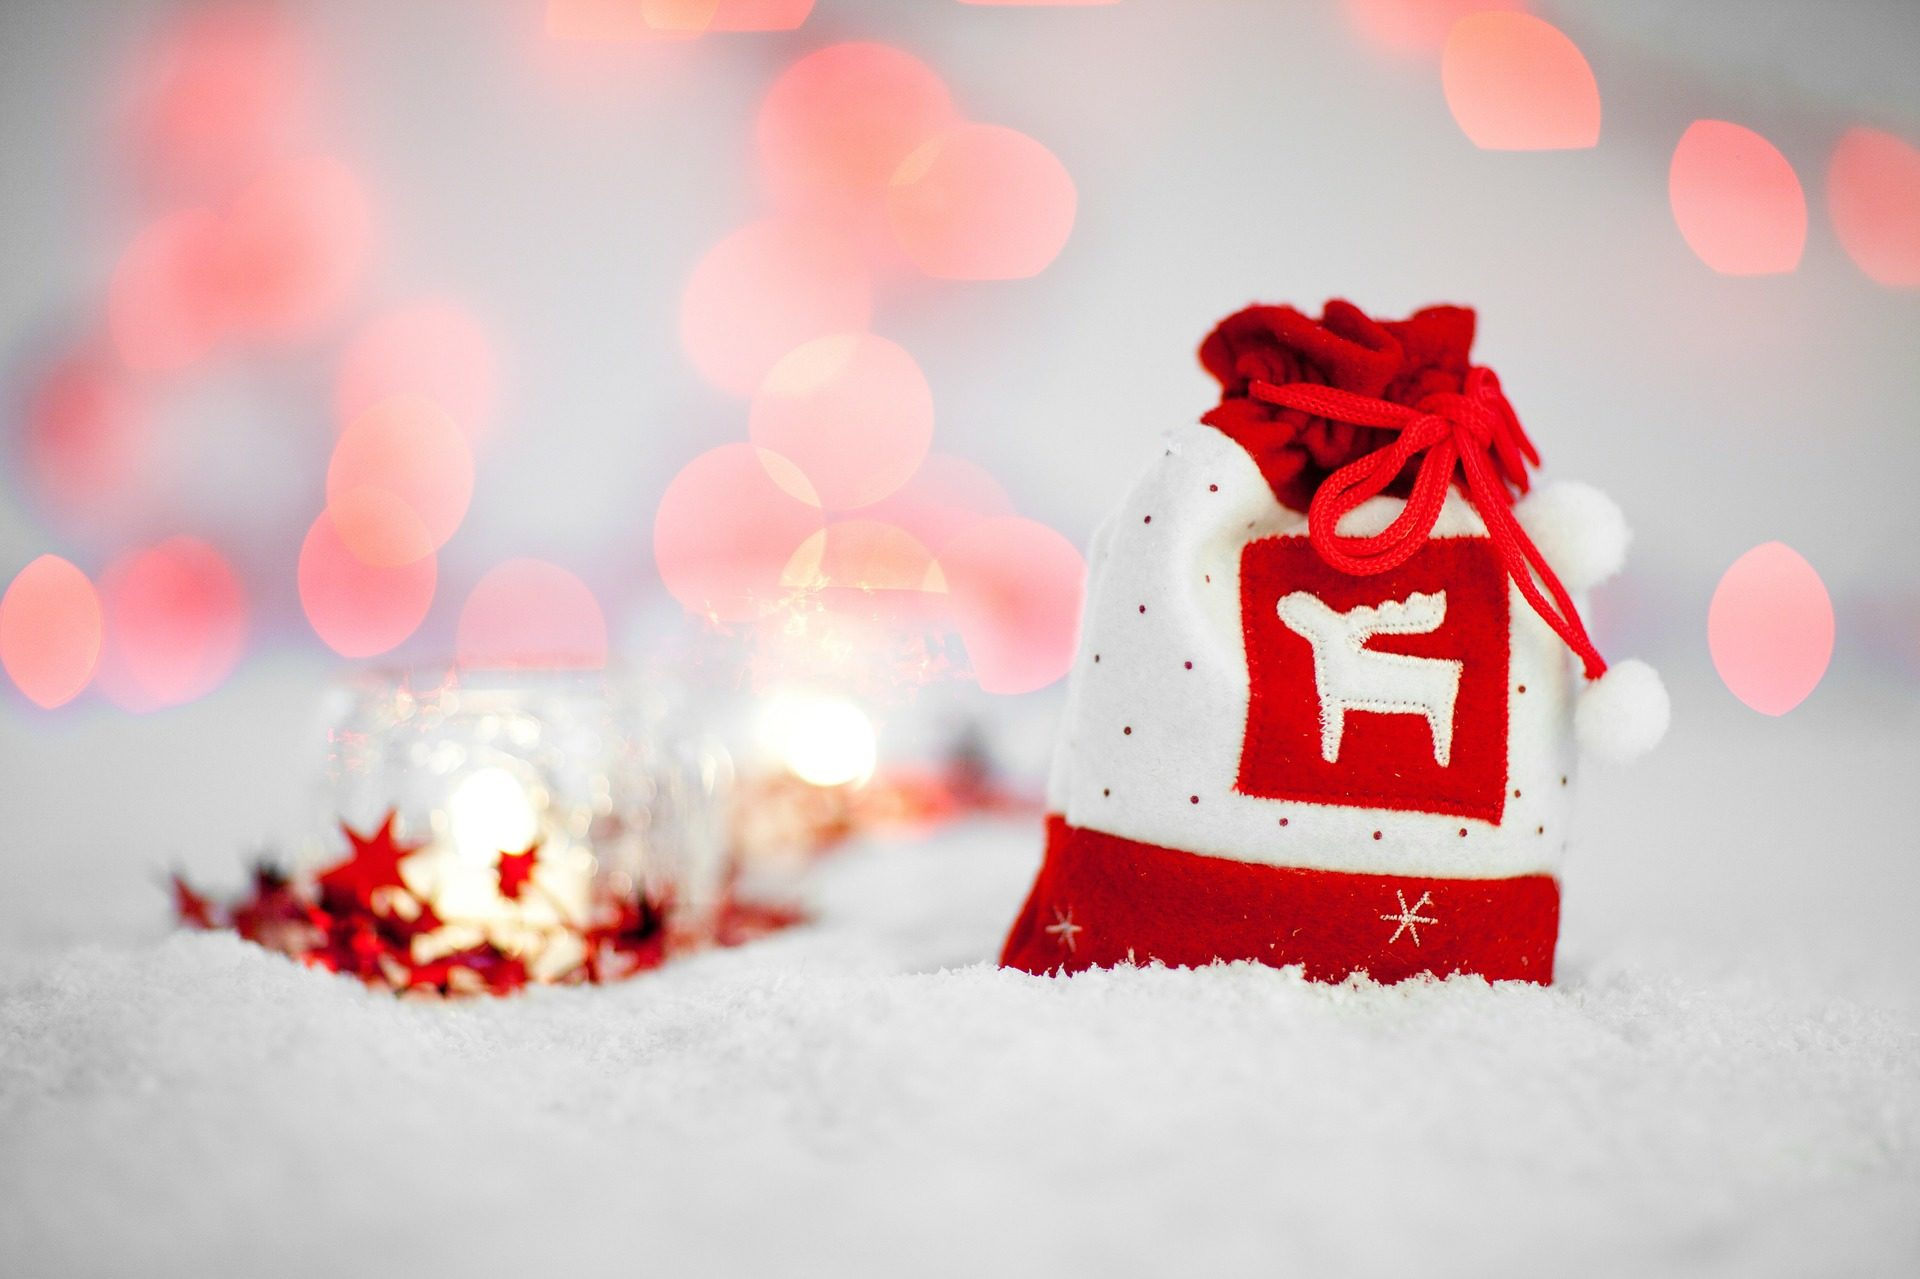 bolsa, regalo, lazo, reno, nieve, navidad - Fondos de Pantalla HD - professor-falken.com